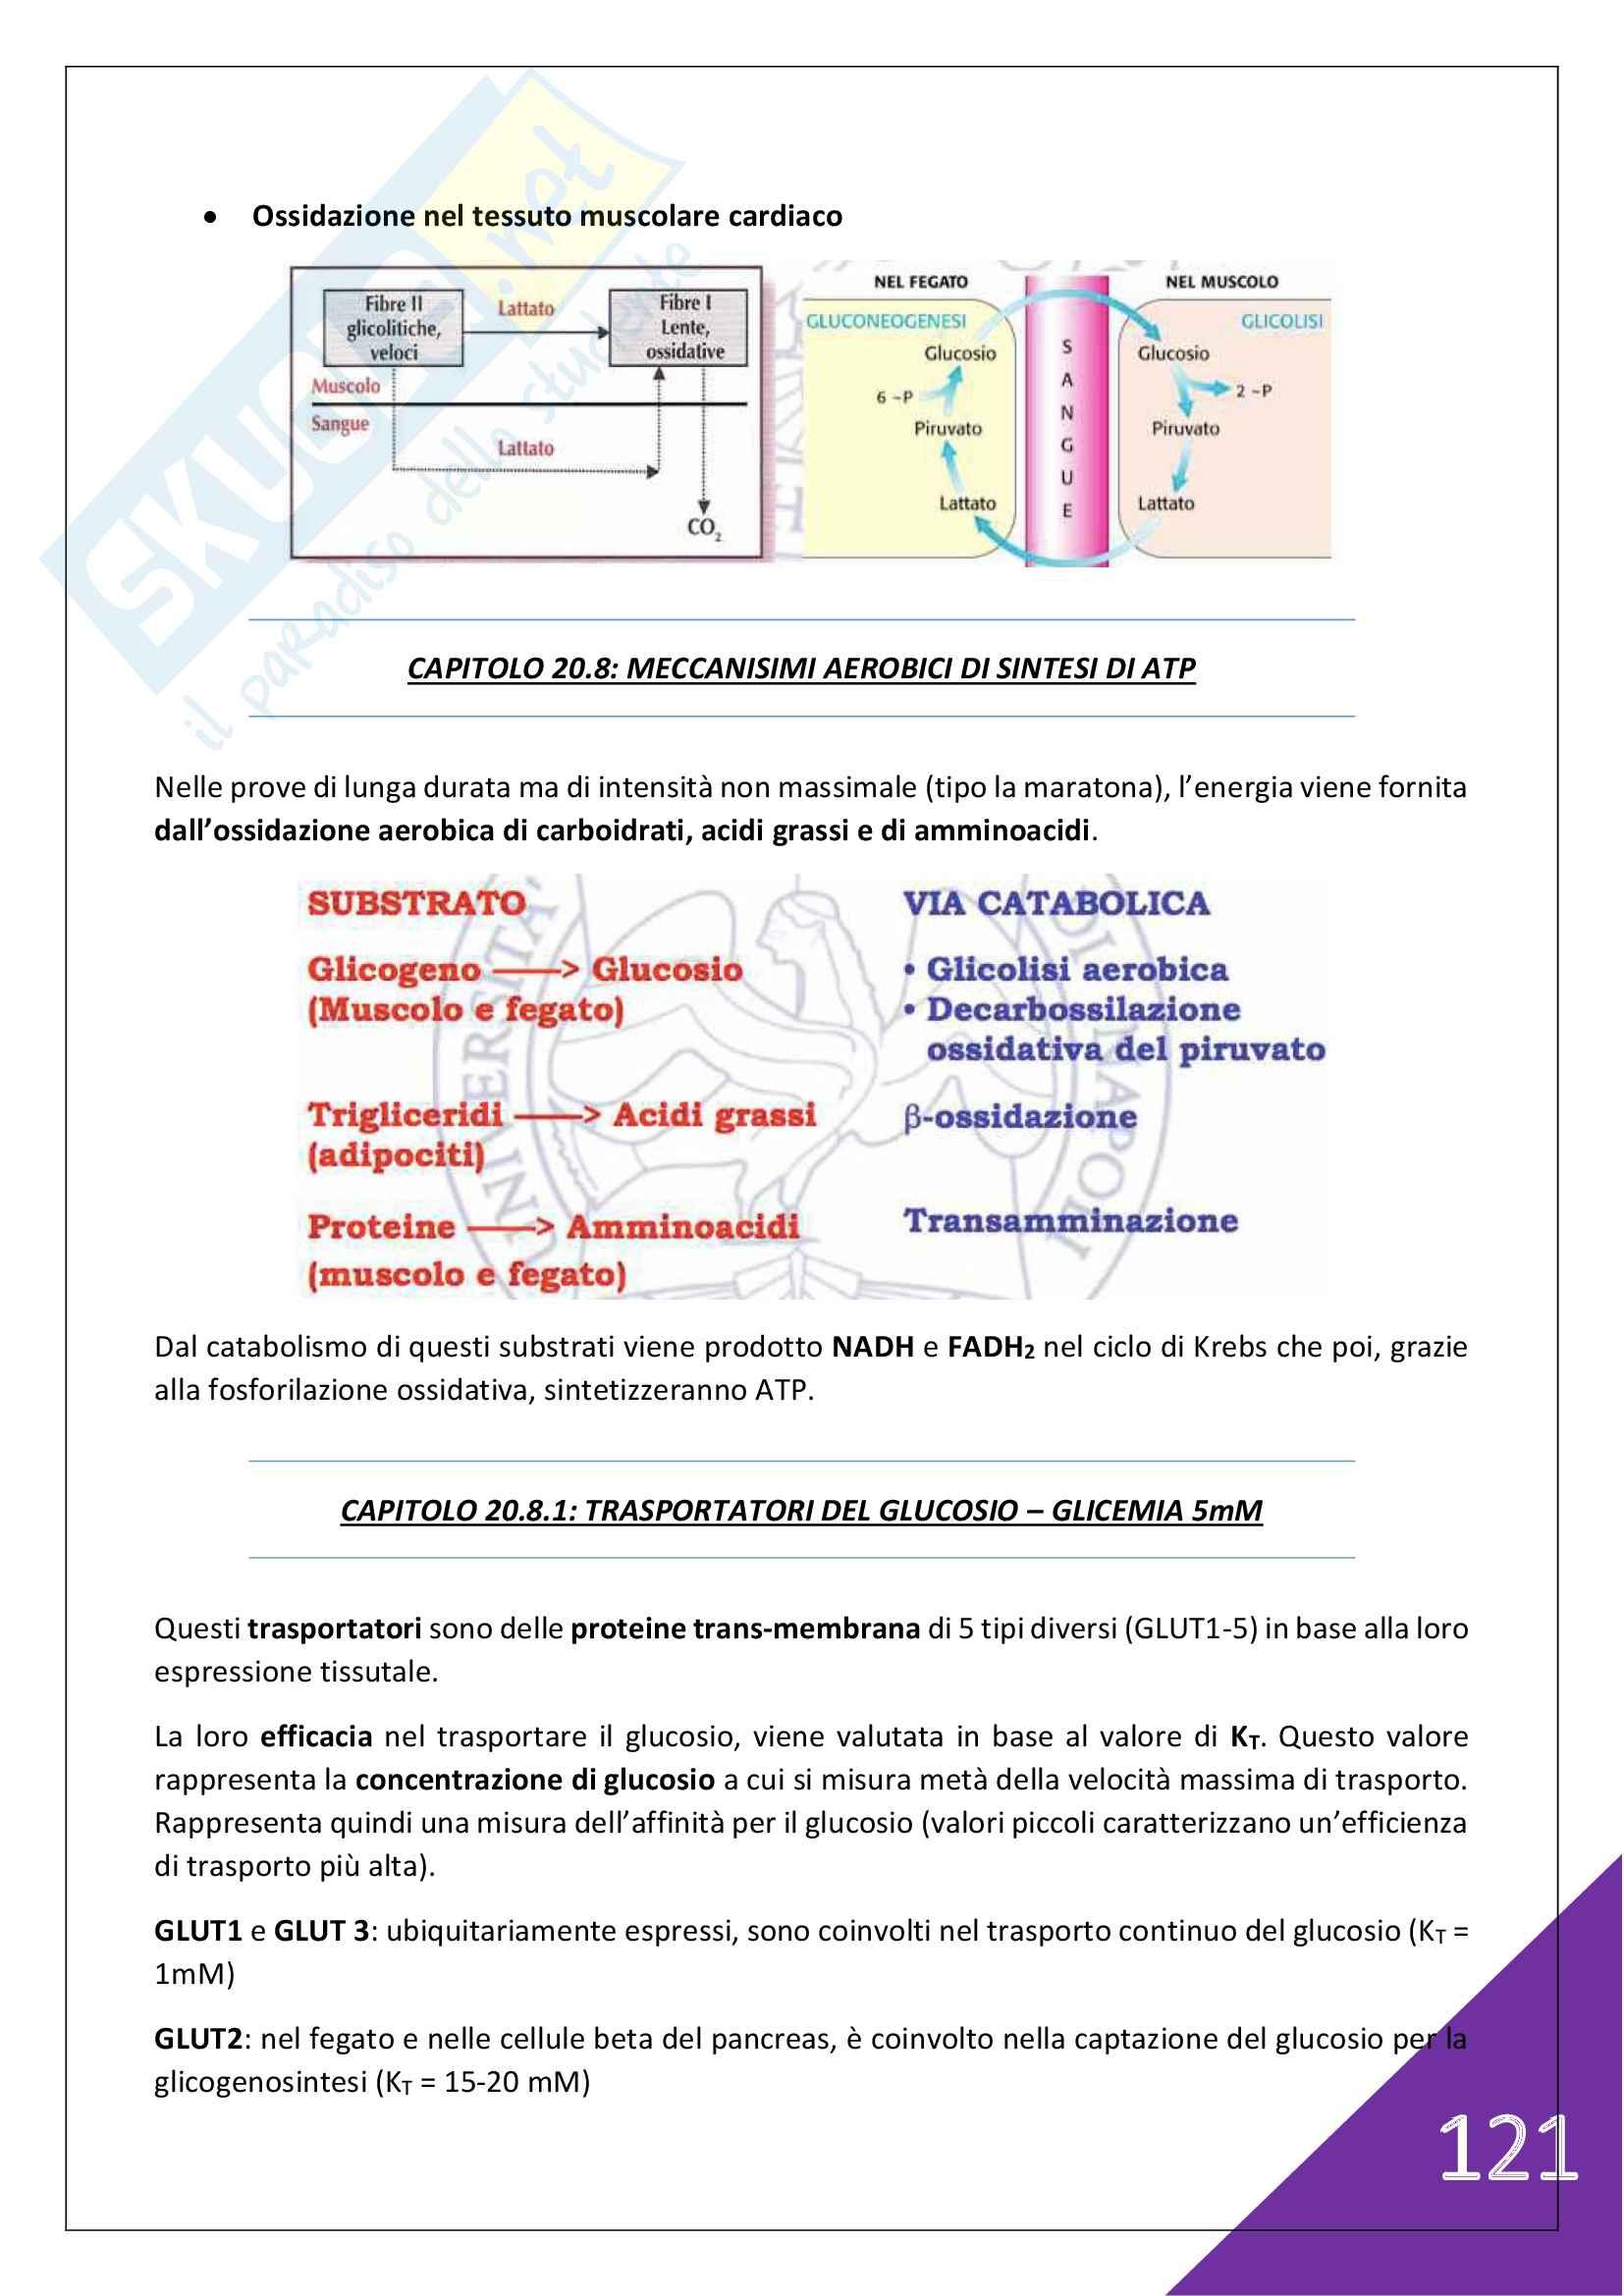 Biochimica Umana - 1° Anno Scienze Motorie Pag. 121